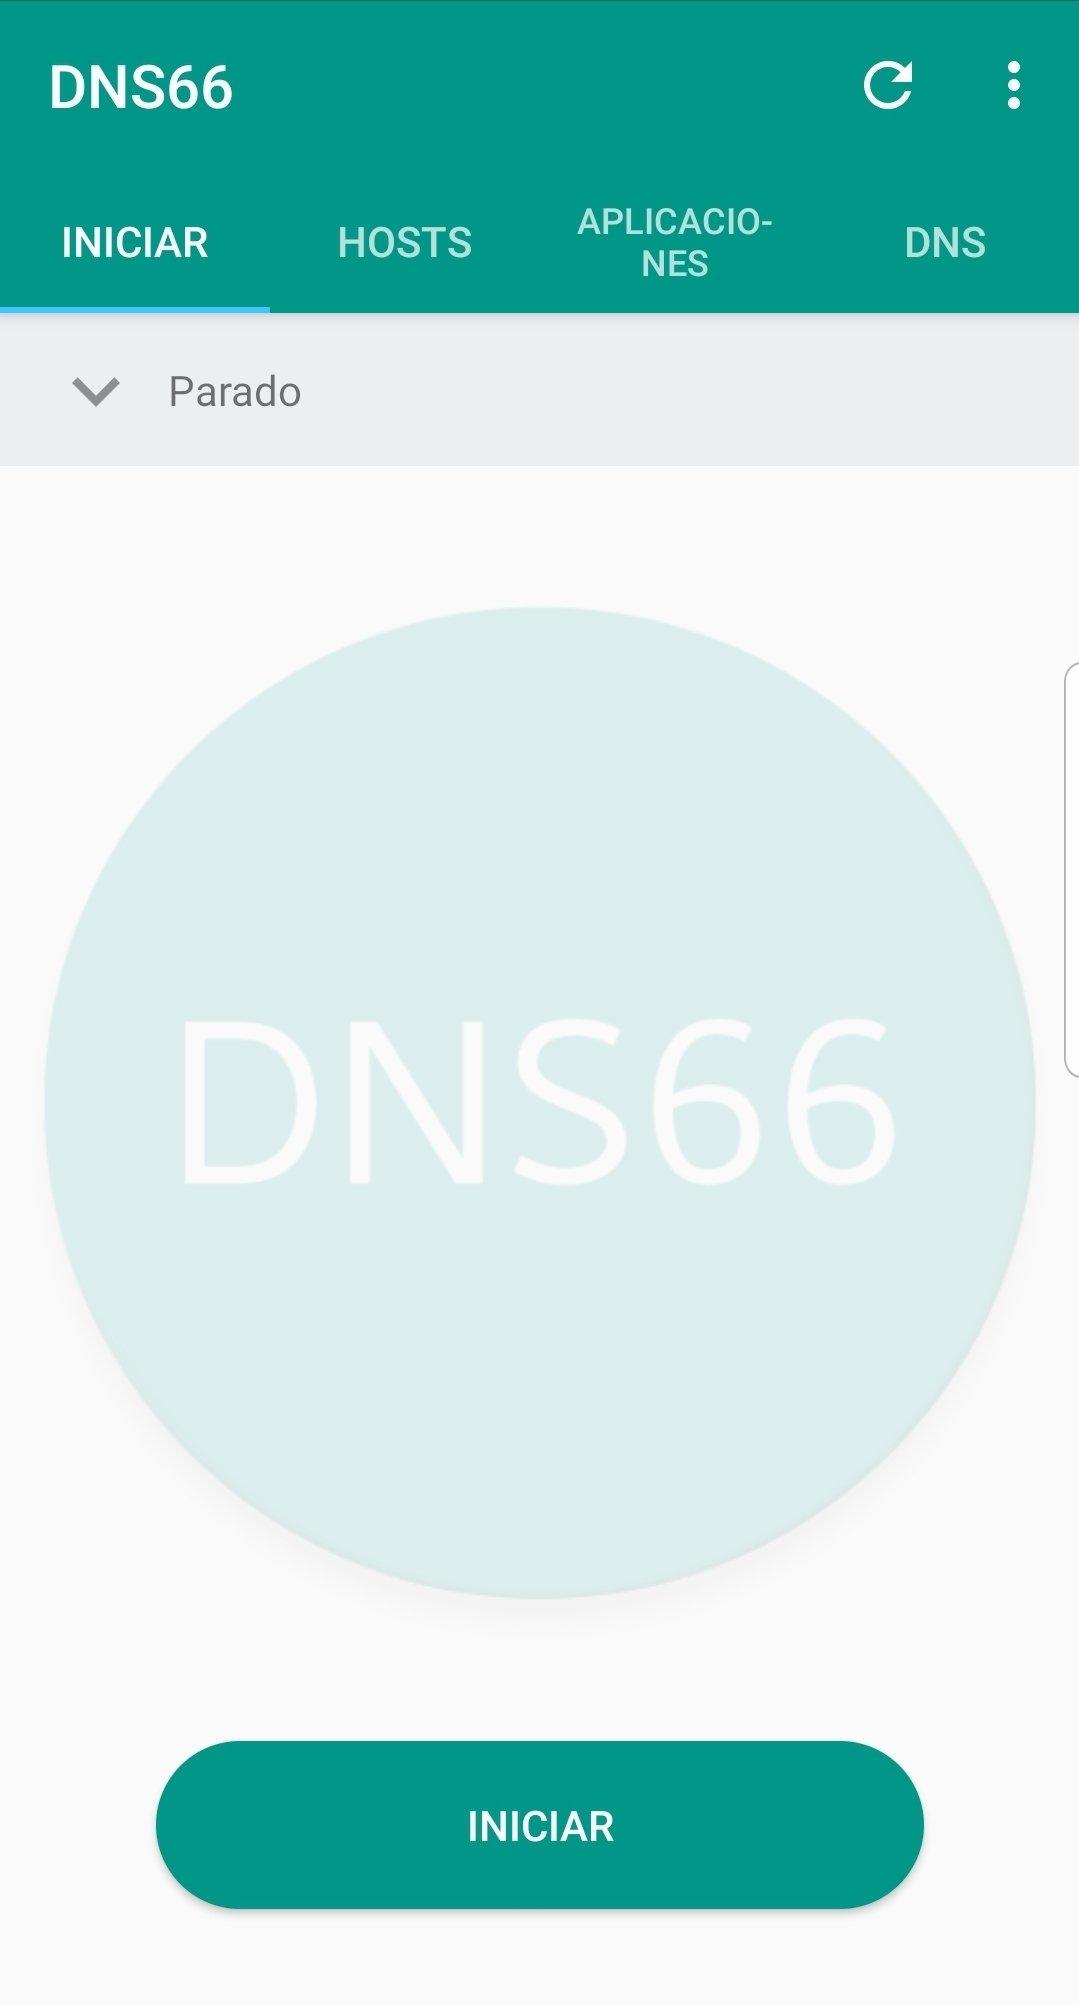 Vista principal de DNS66